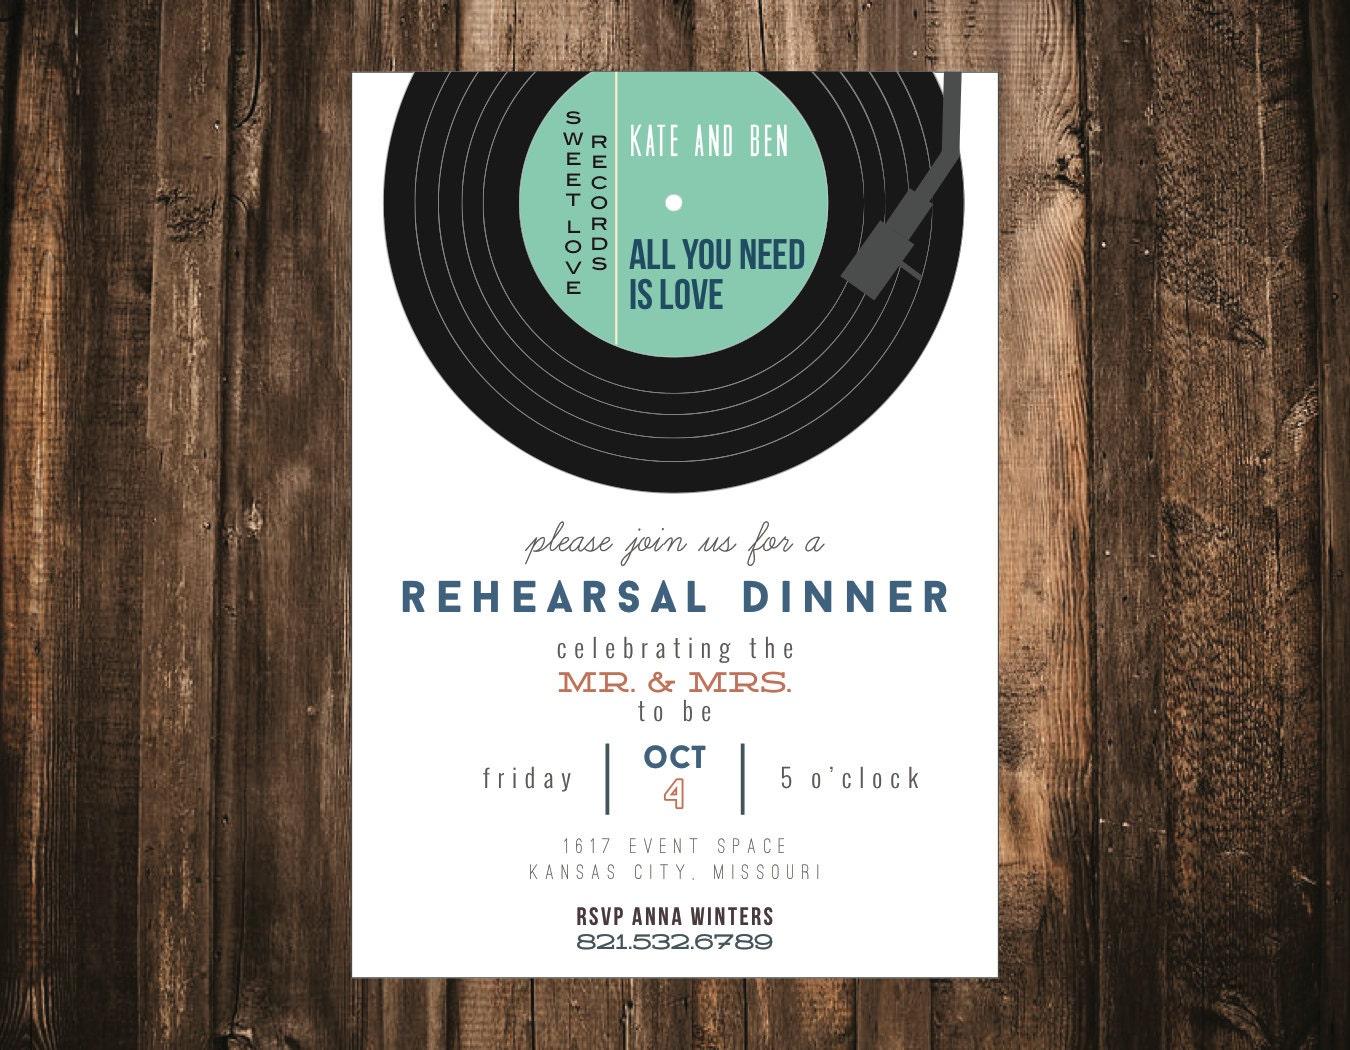 Record Wedding Invitations: Record Wedding Rehearsal Dinner Invitation // 10 Printed Sets